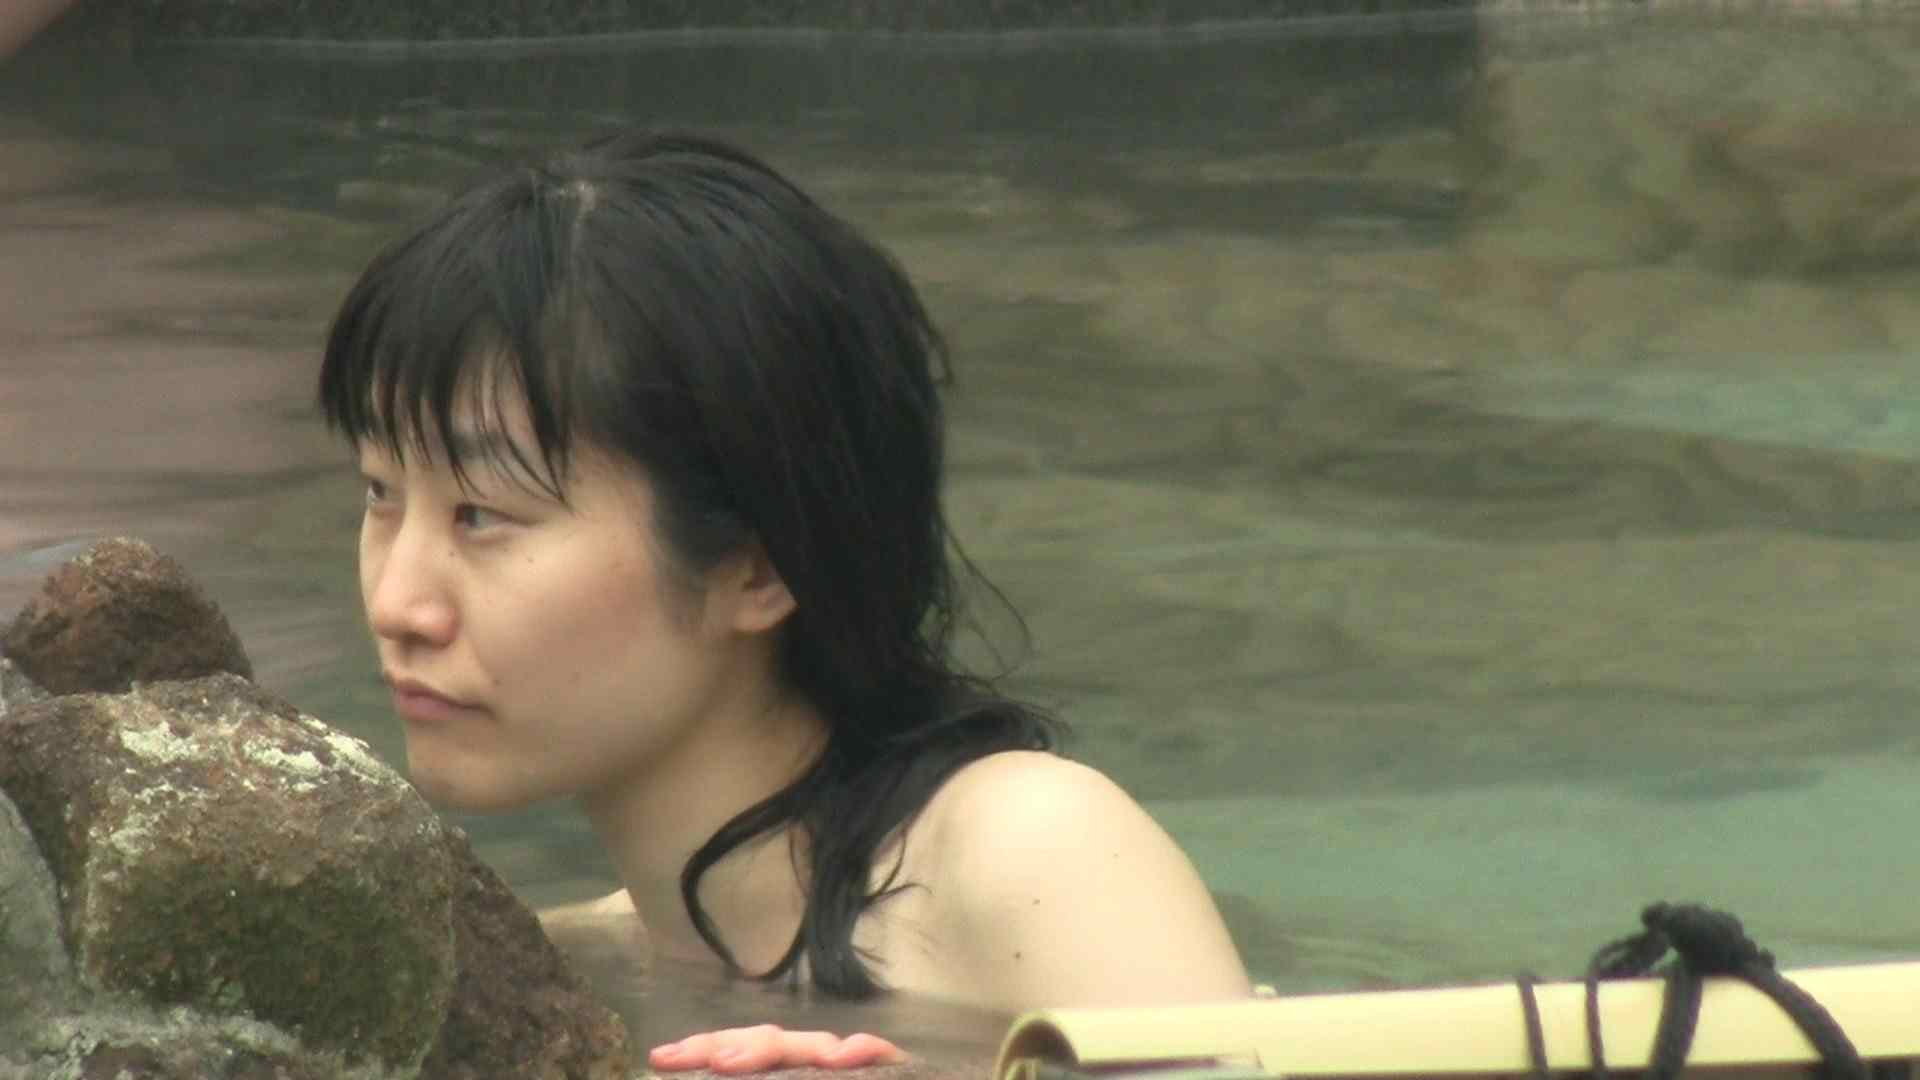 Aquaな露天風呂Vol.14【VIP】 盗撮シリーズ   露天風呂編  94PIX 53